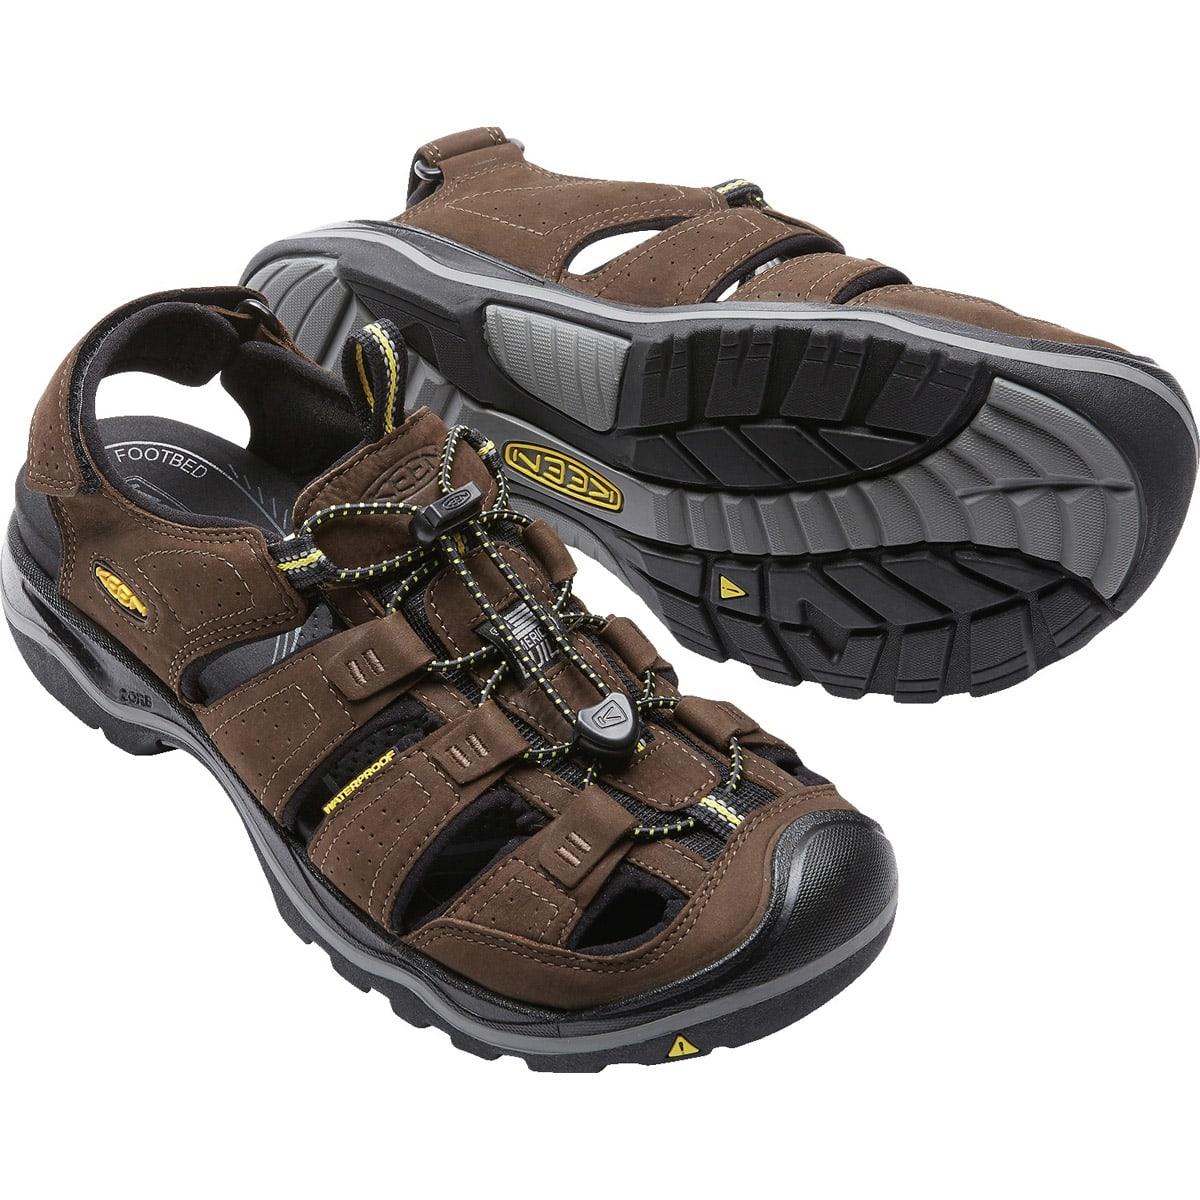 KEEN SANDALS Men's RIALTO BISON BLACK Size 10